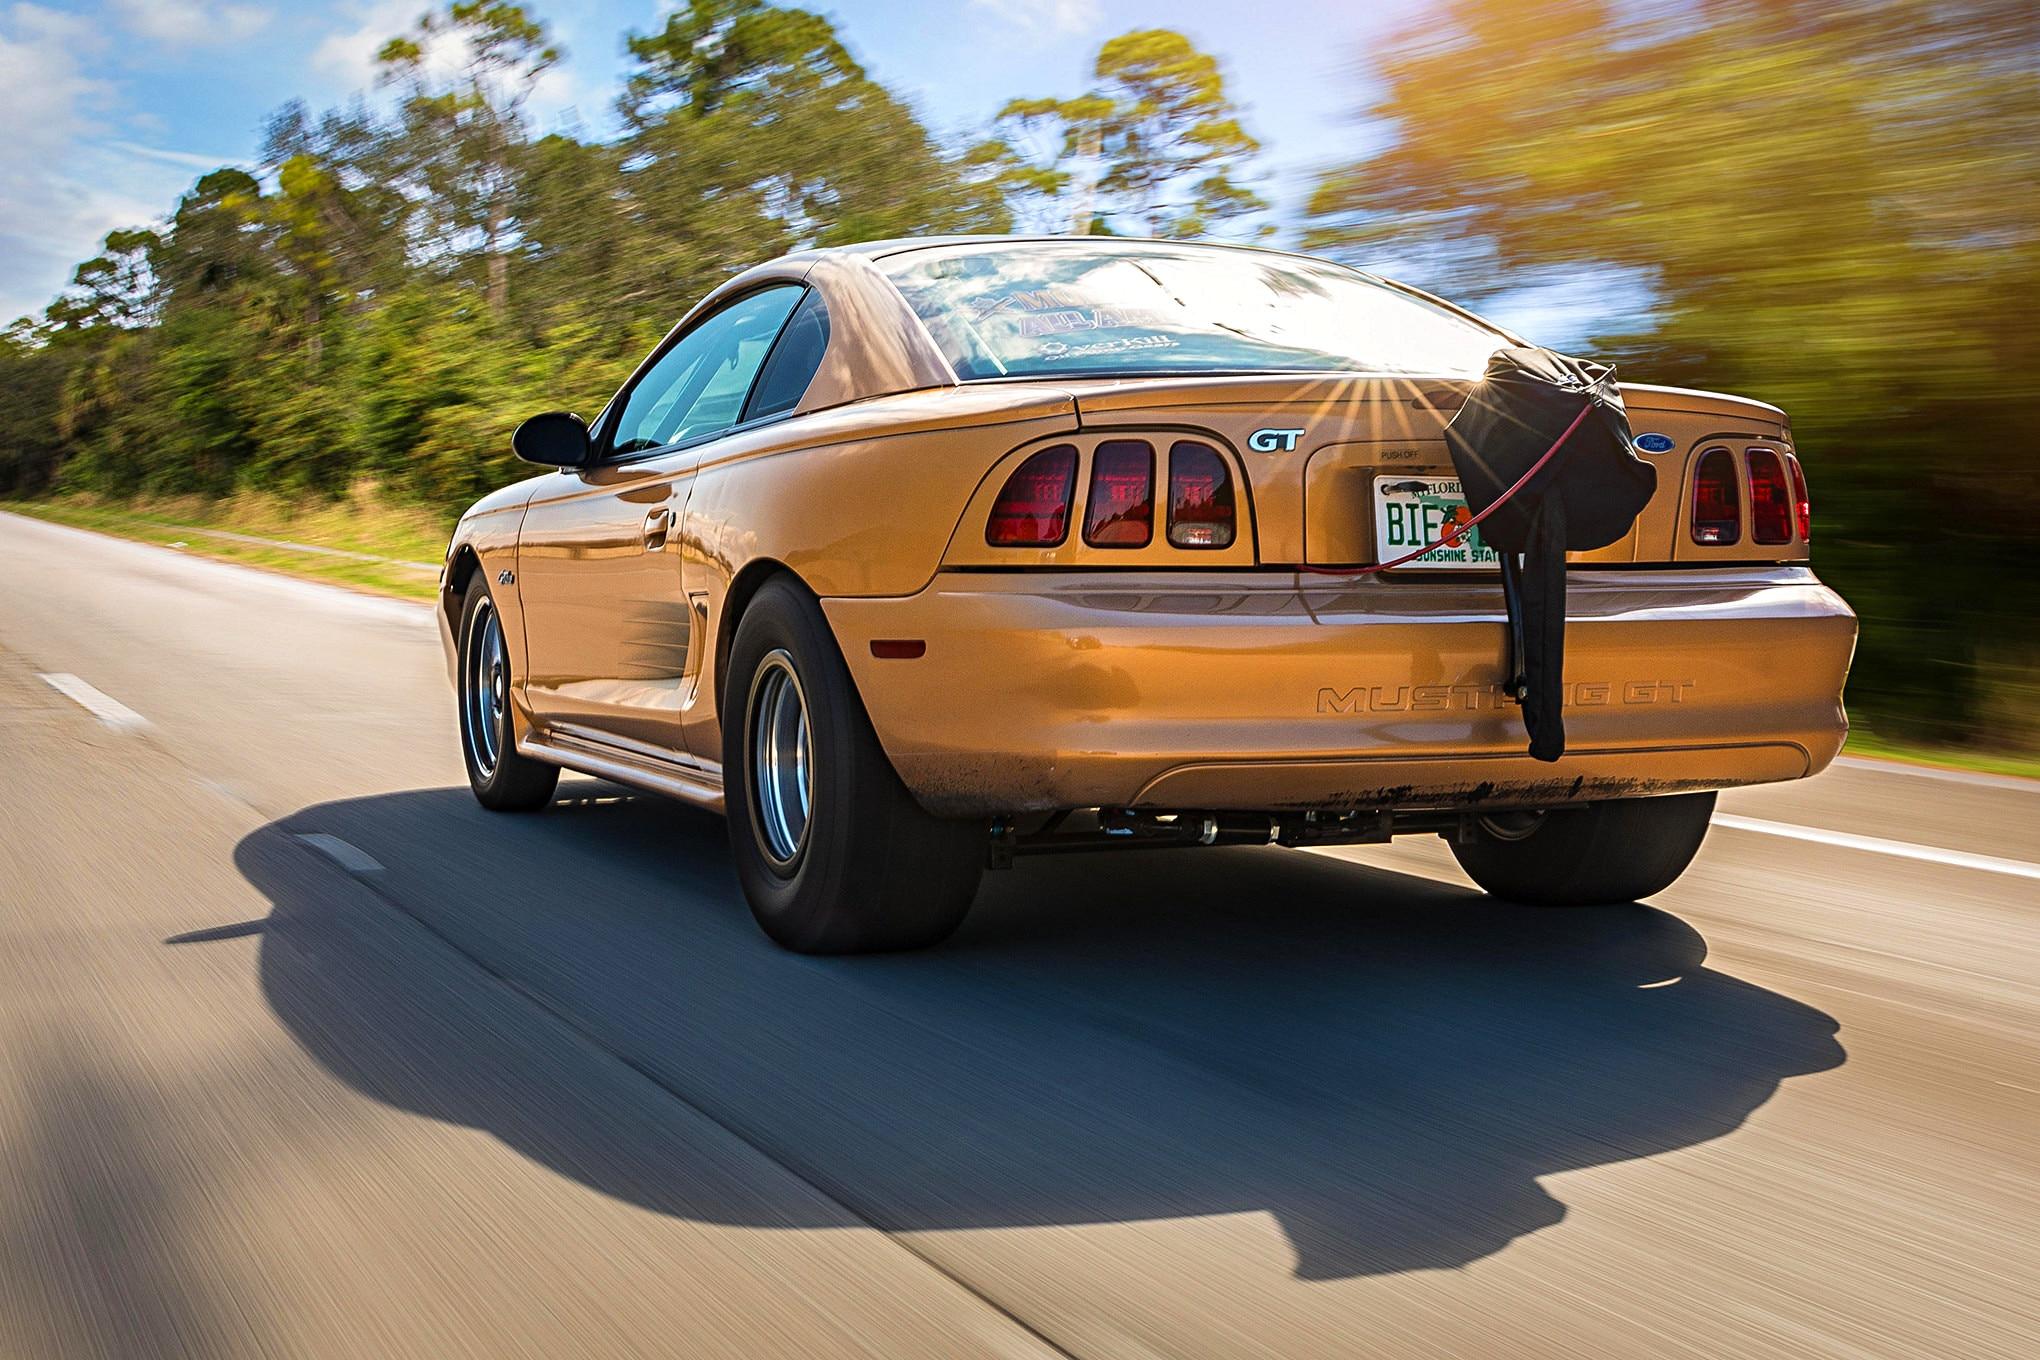 SN95 Kurtis Forsberg 1997 Ford Mustang Gt 002